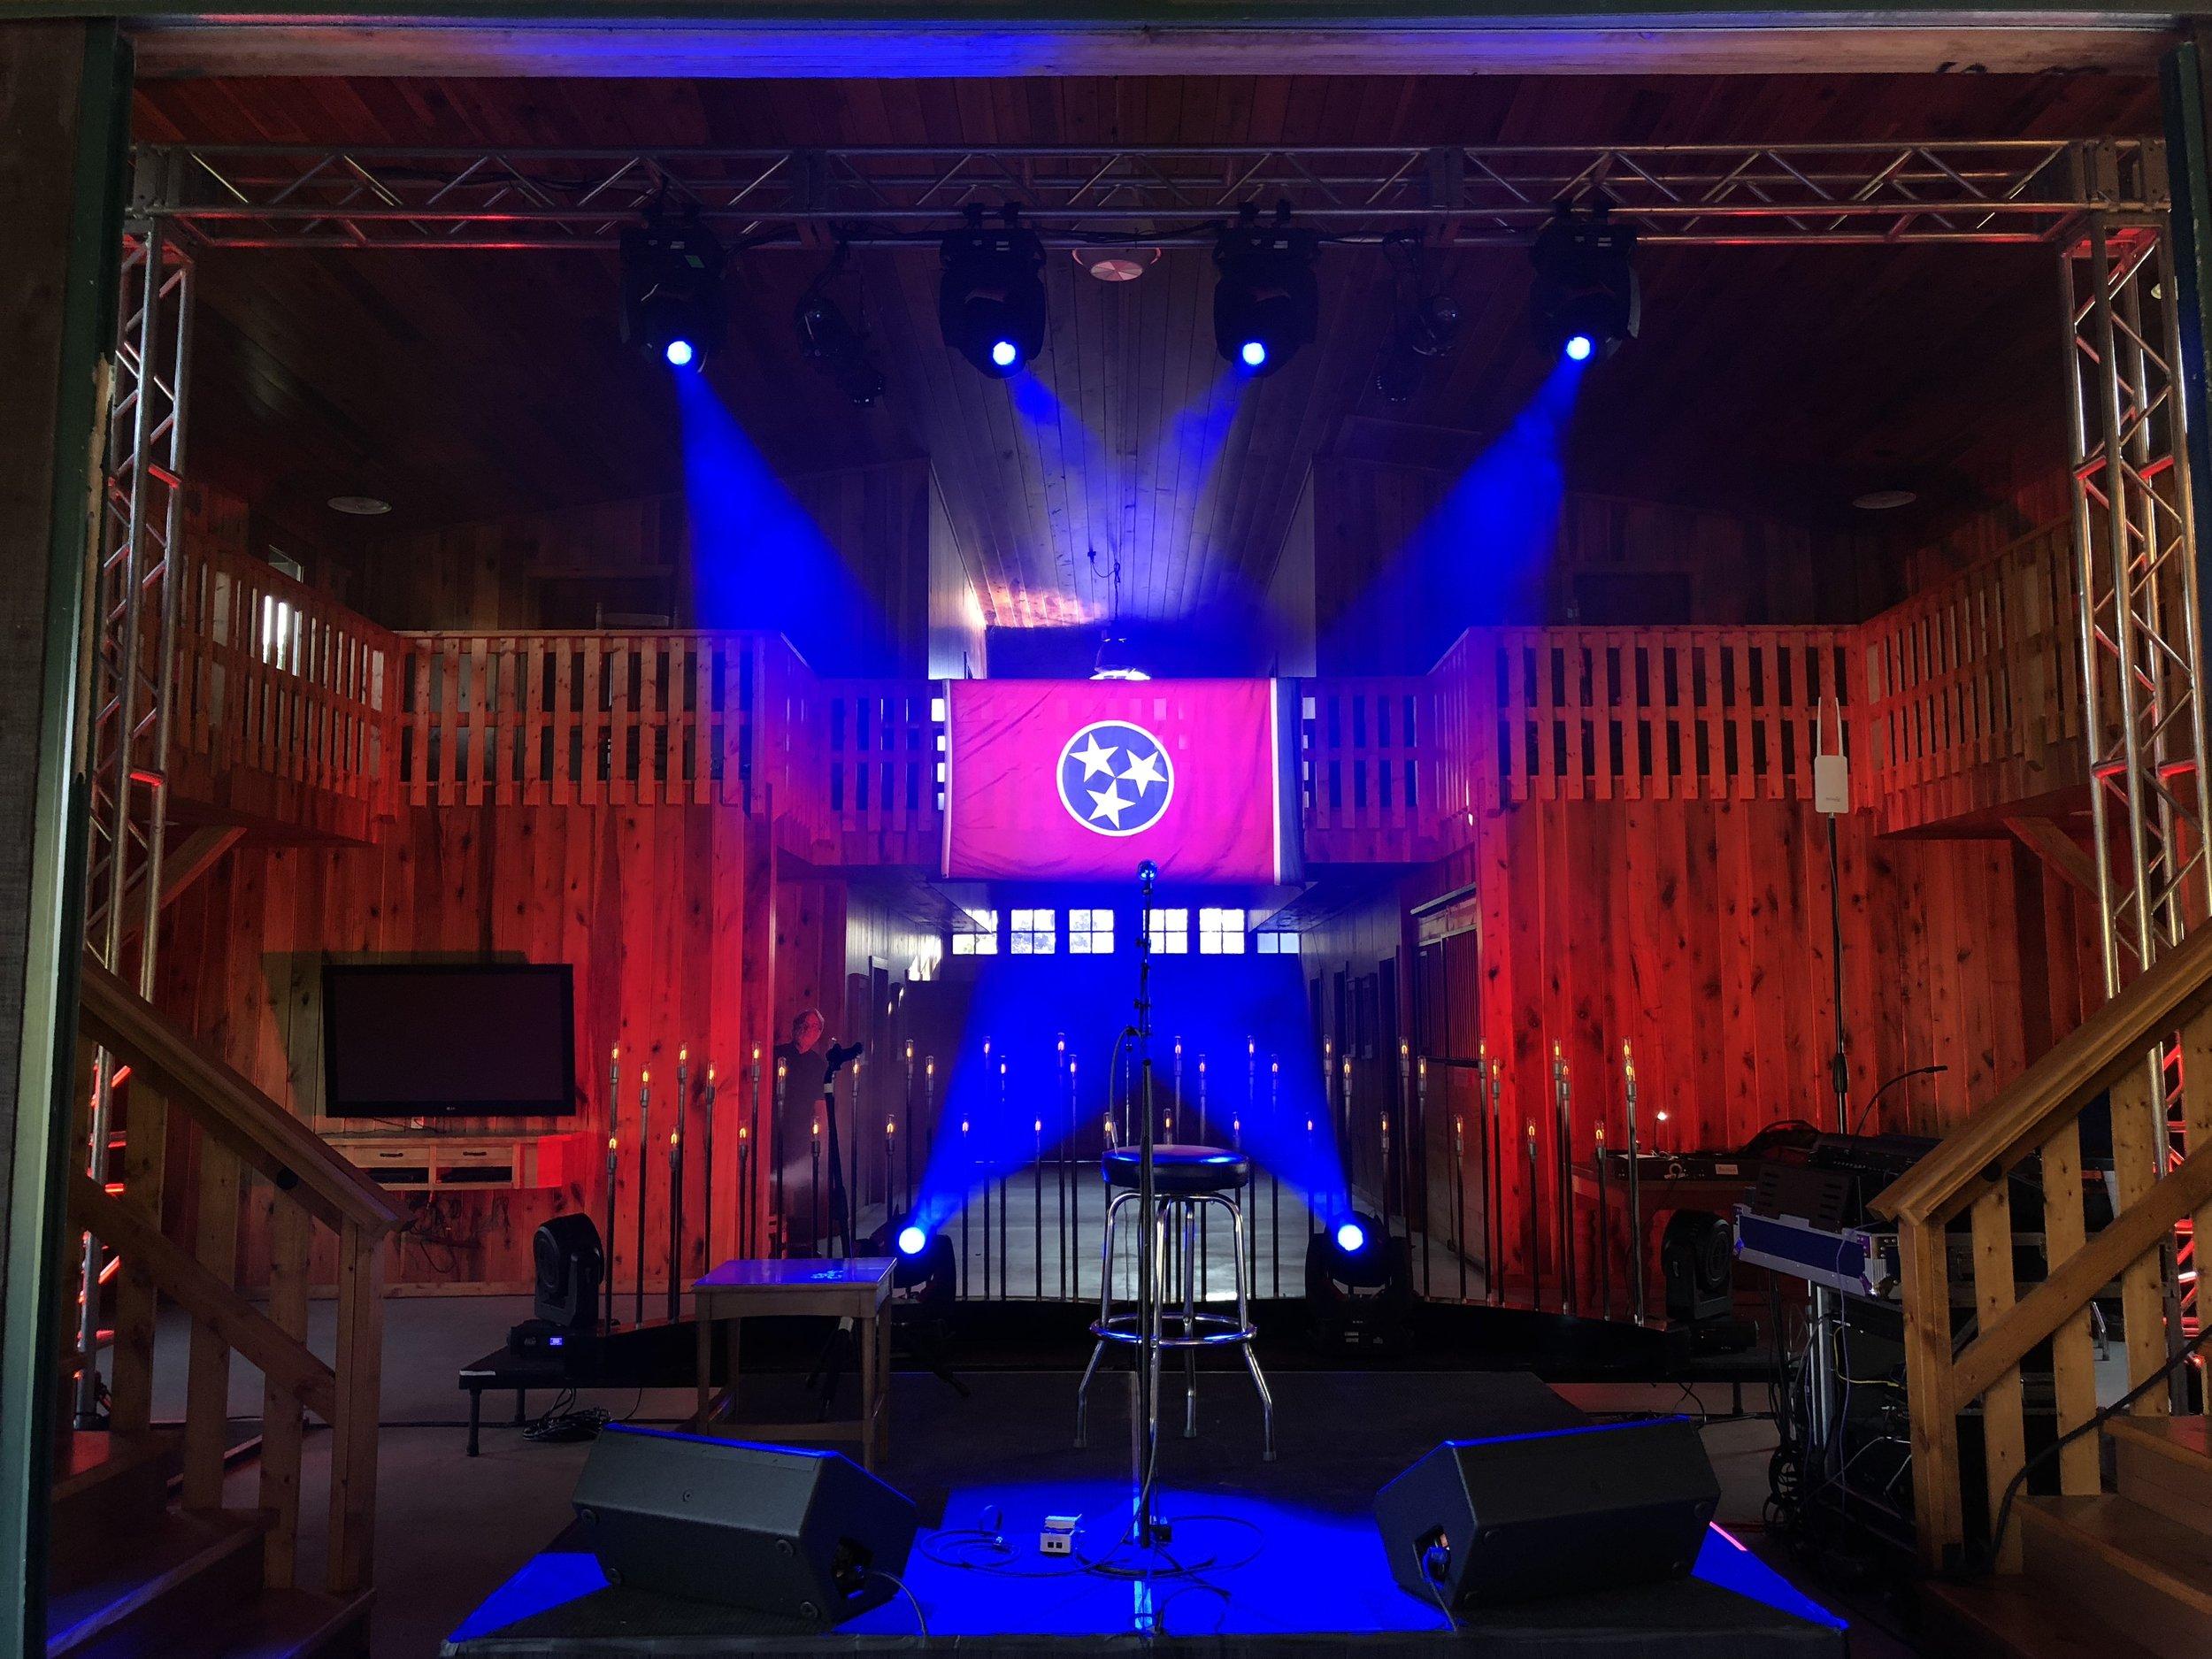 Bill Lee Fundraiser 2018  Venue, City, State